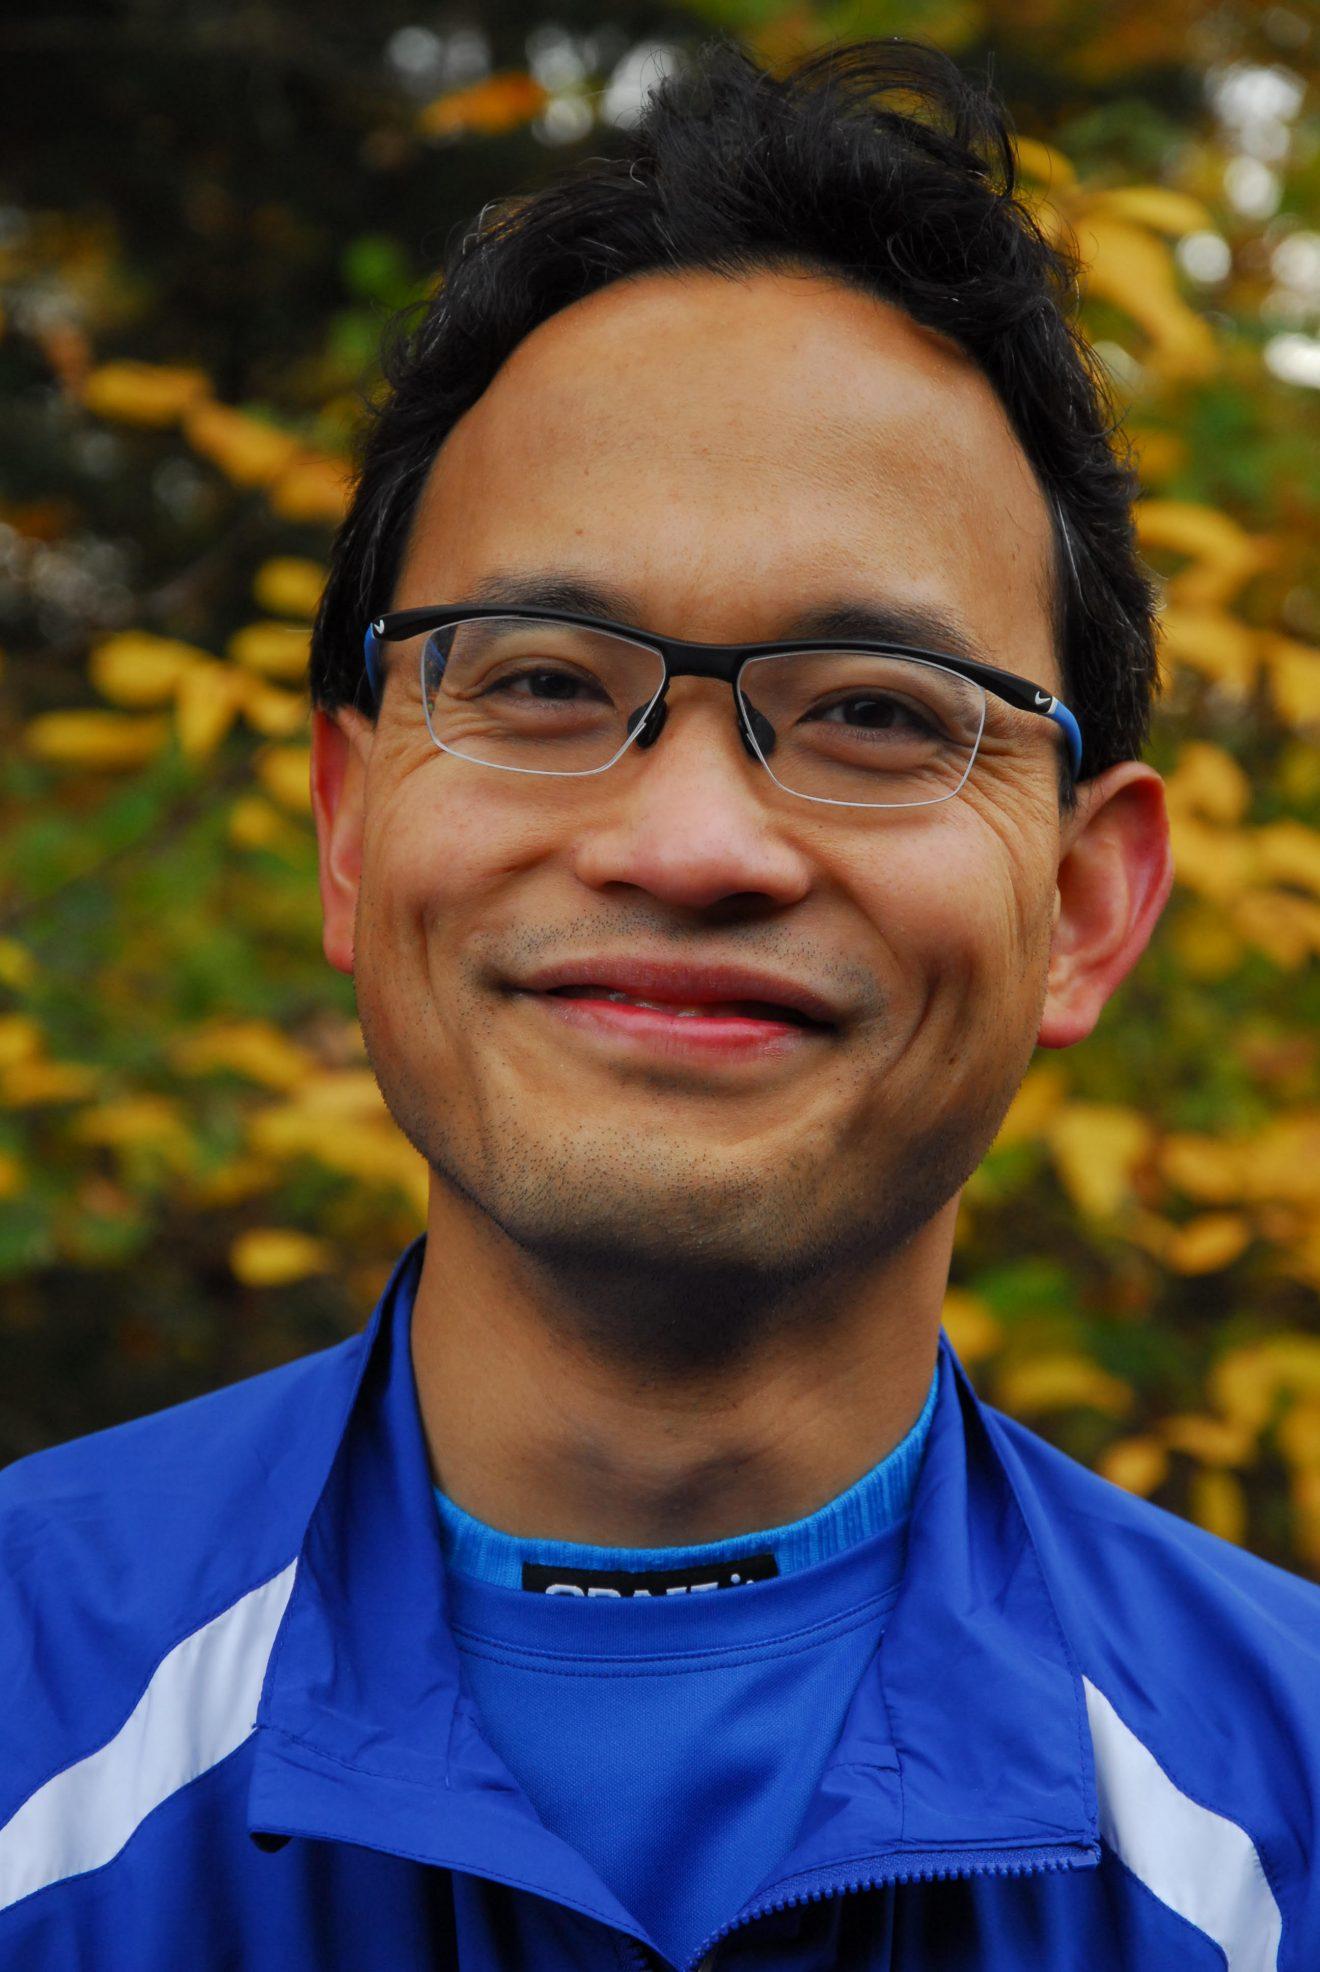 Vrijwilliger in het zonnetje: Patrick Eysbach